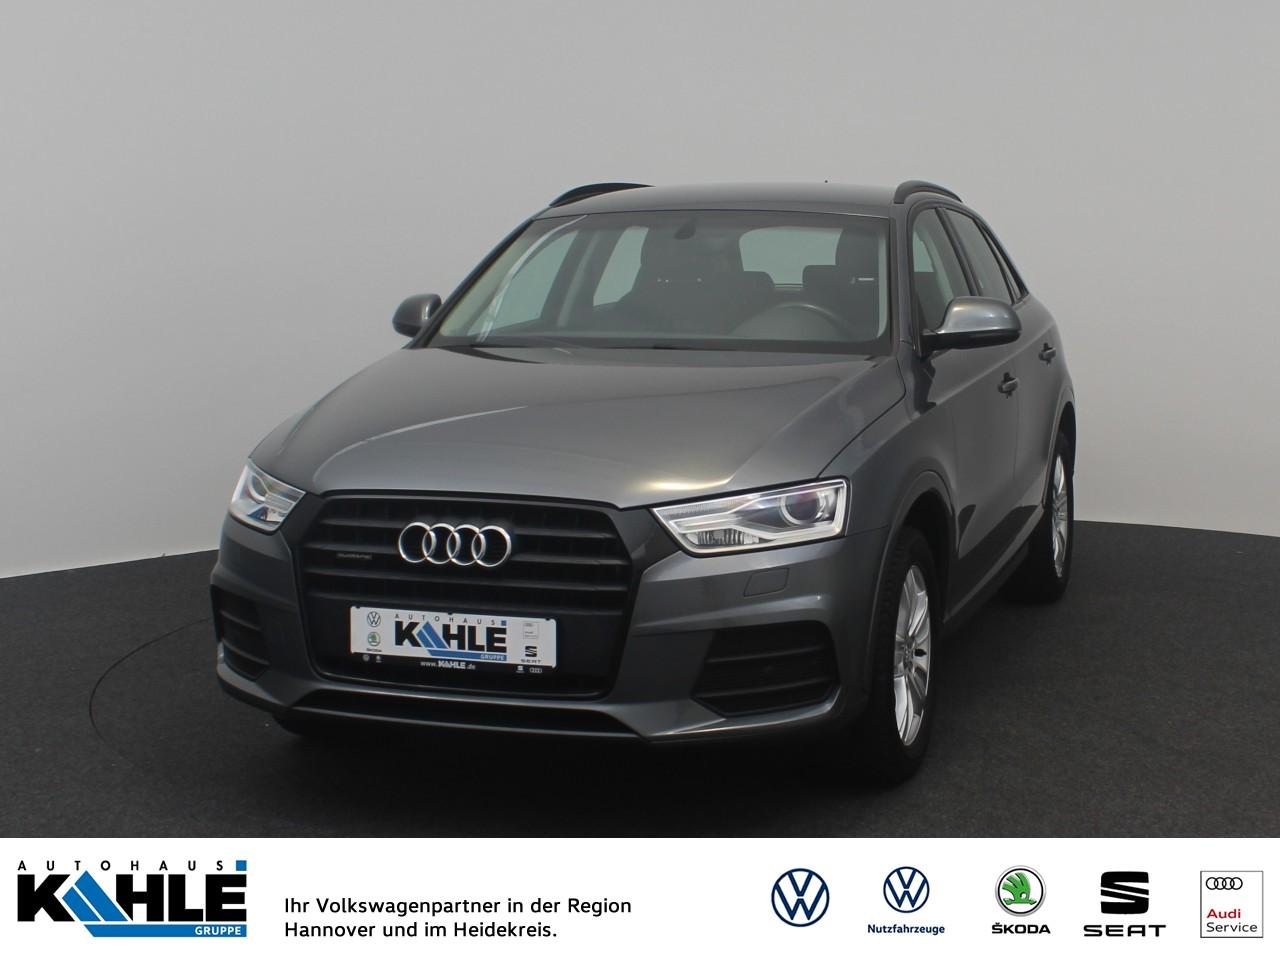 Audi Q3 2.0 TDI Sport quattro Navi Xenon AHK Klima, Jahr 2016, Diesel